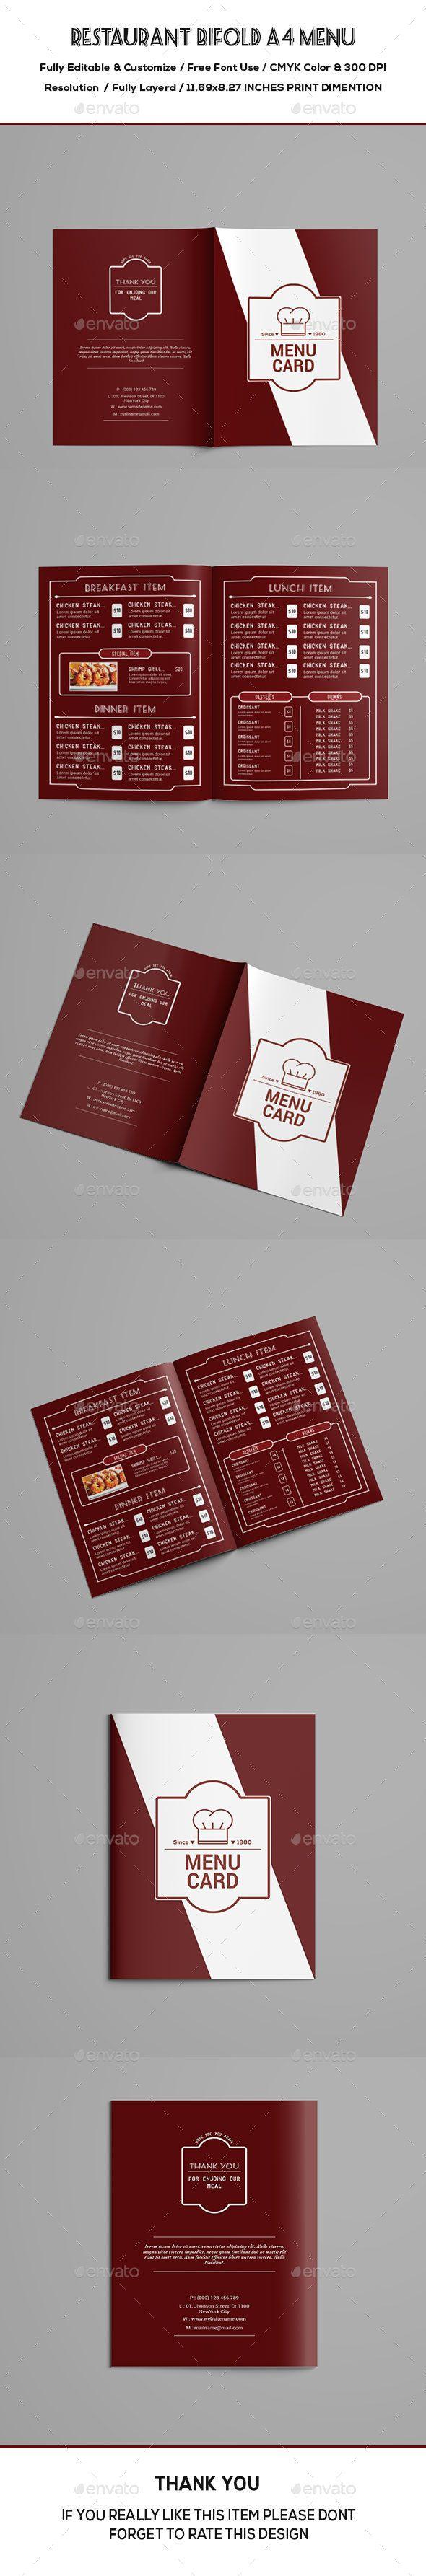 253 best restaurant menu designs images on pinterest | restaurant